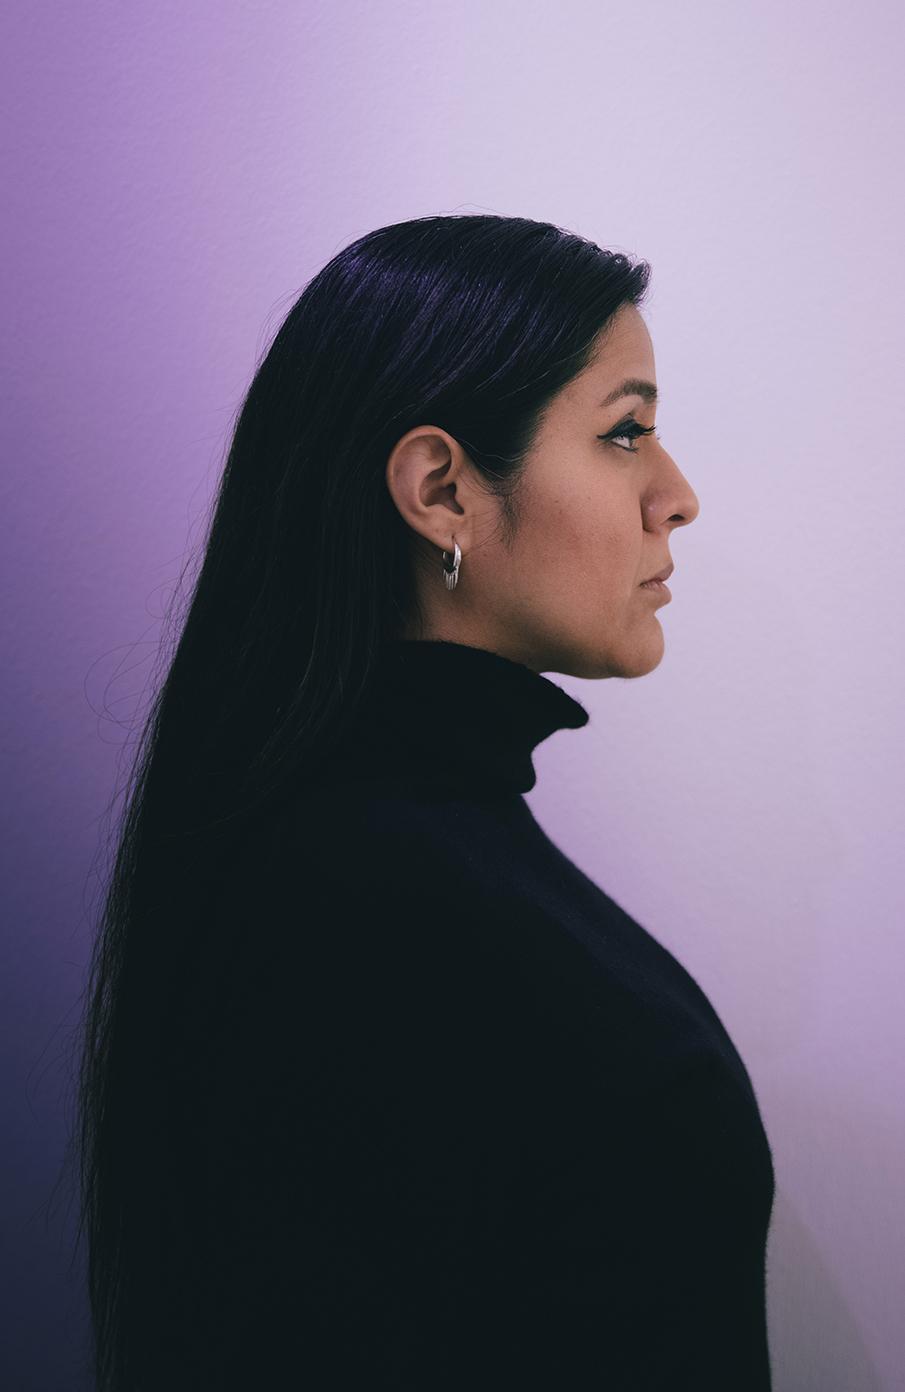 Maria Chavez. Photo by Melanie Marsman